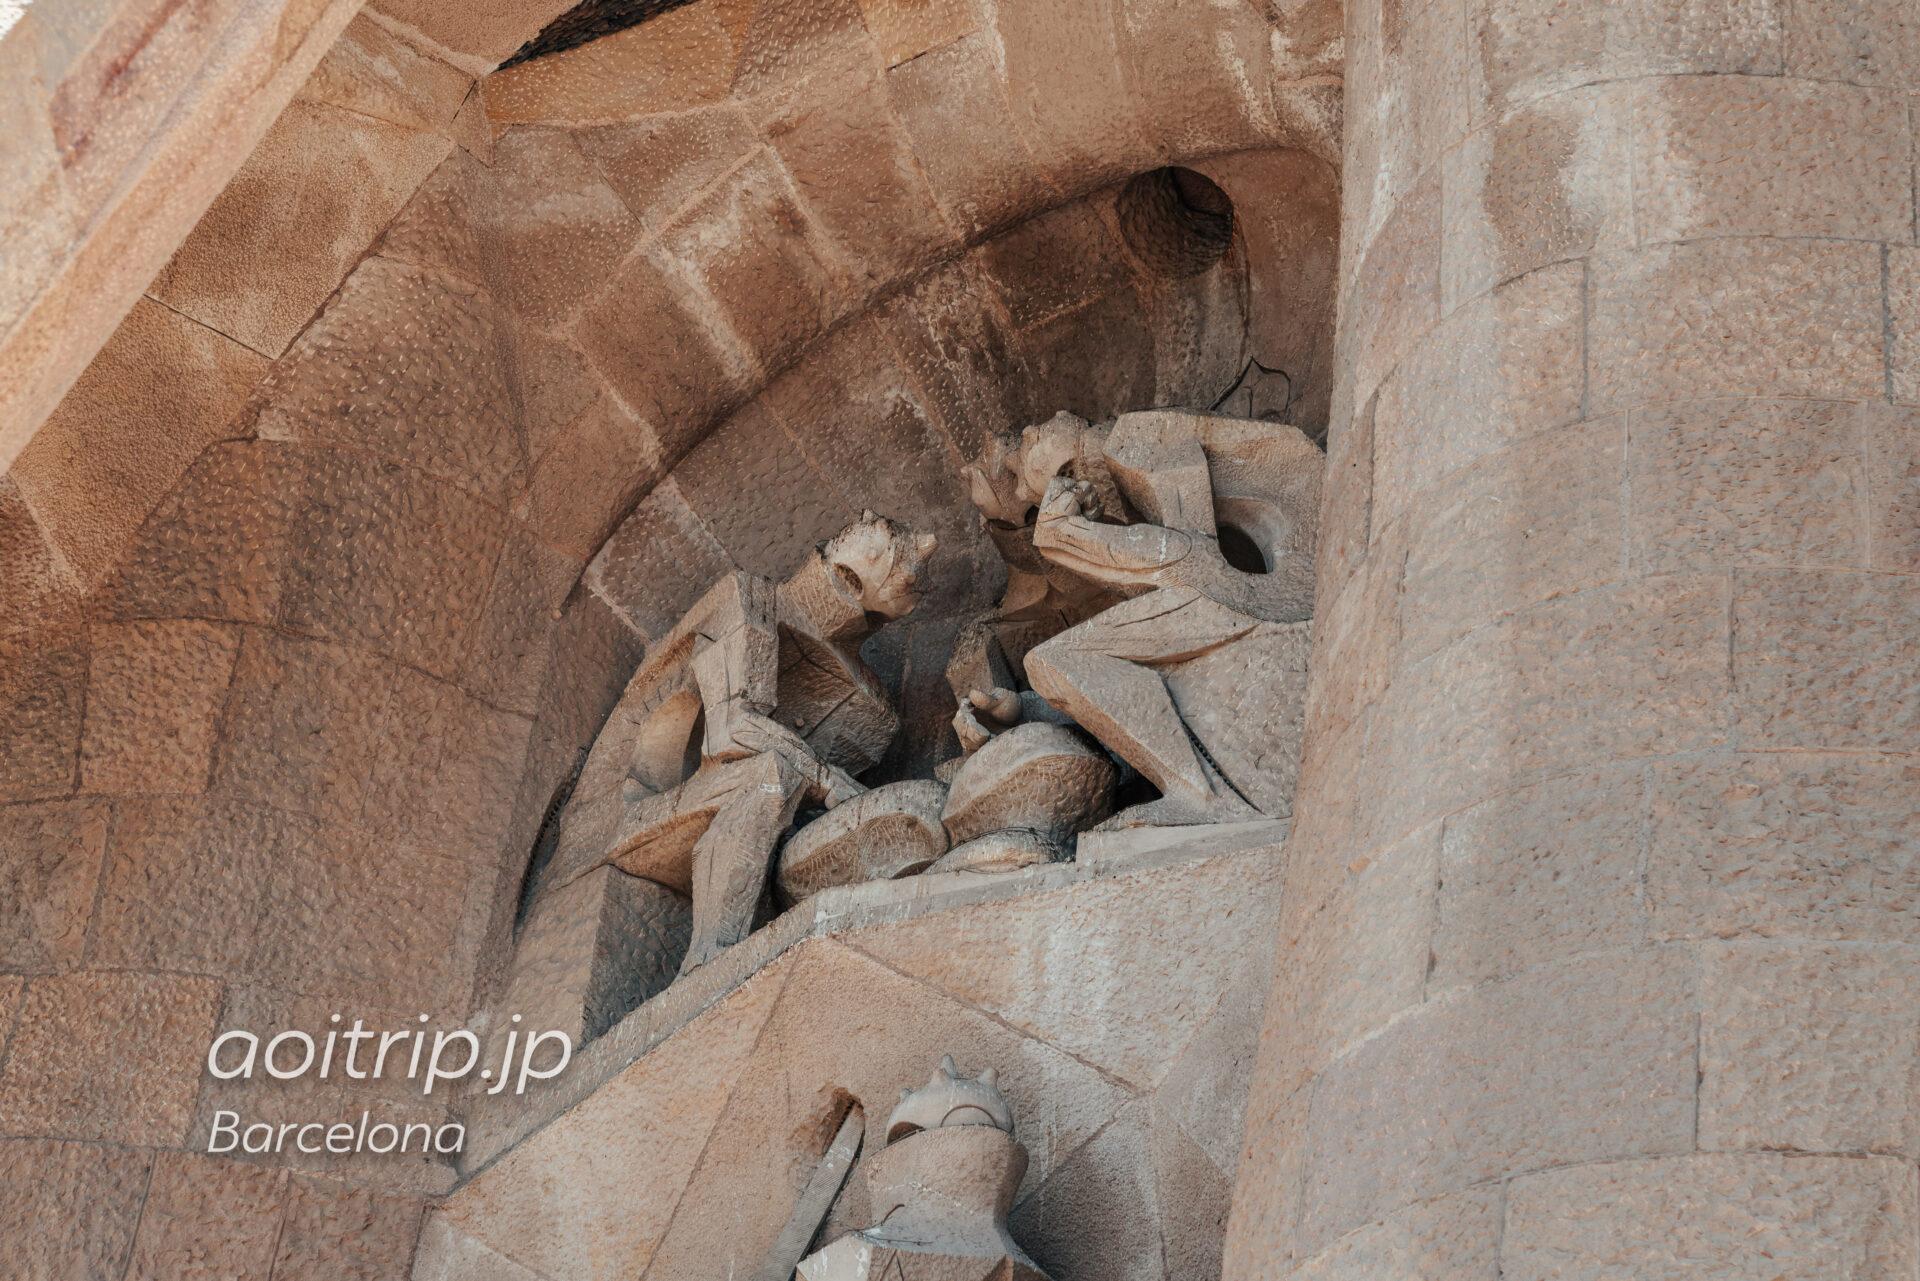 Basílica de la Sagrada Família(Façana de la Passió, The soldiers playing for the tunic of Jesus)